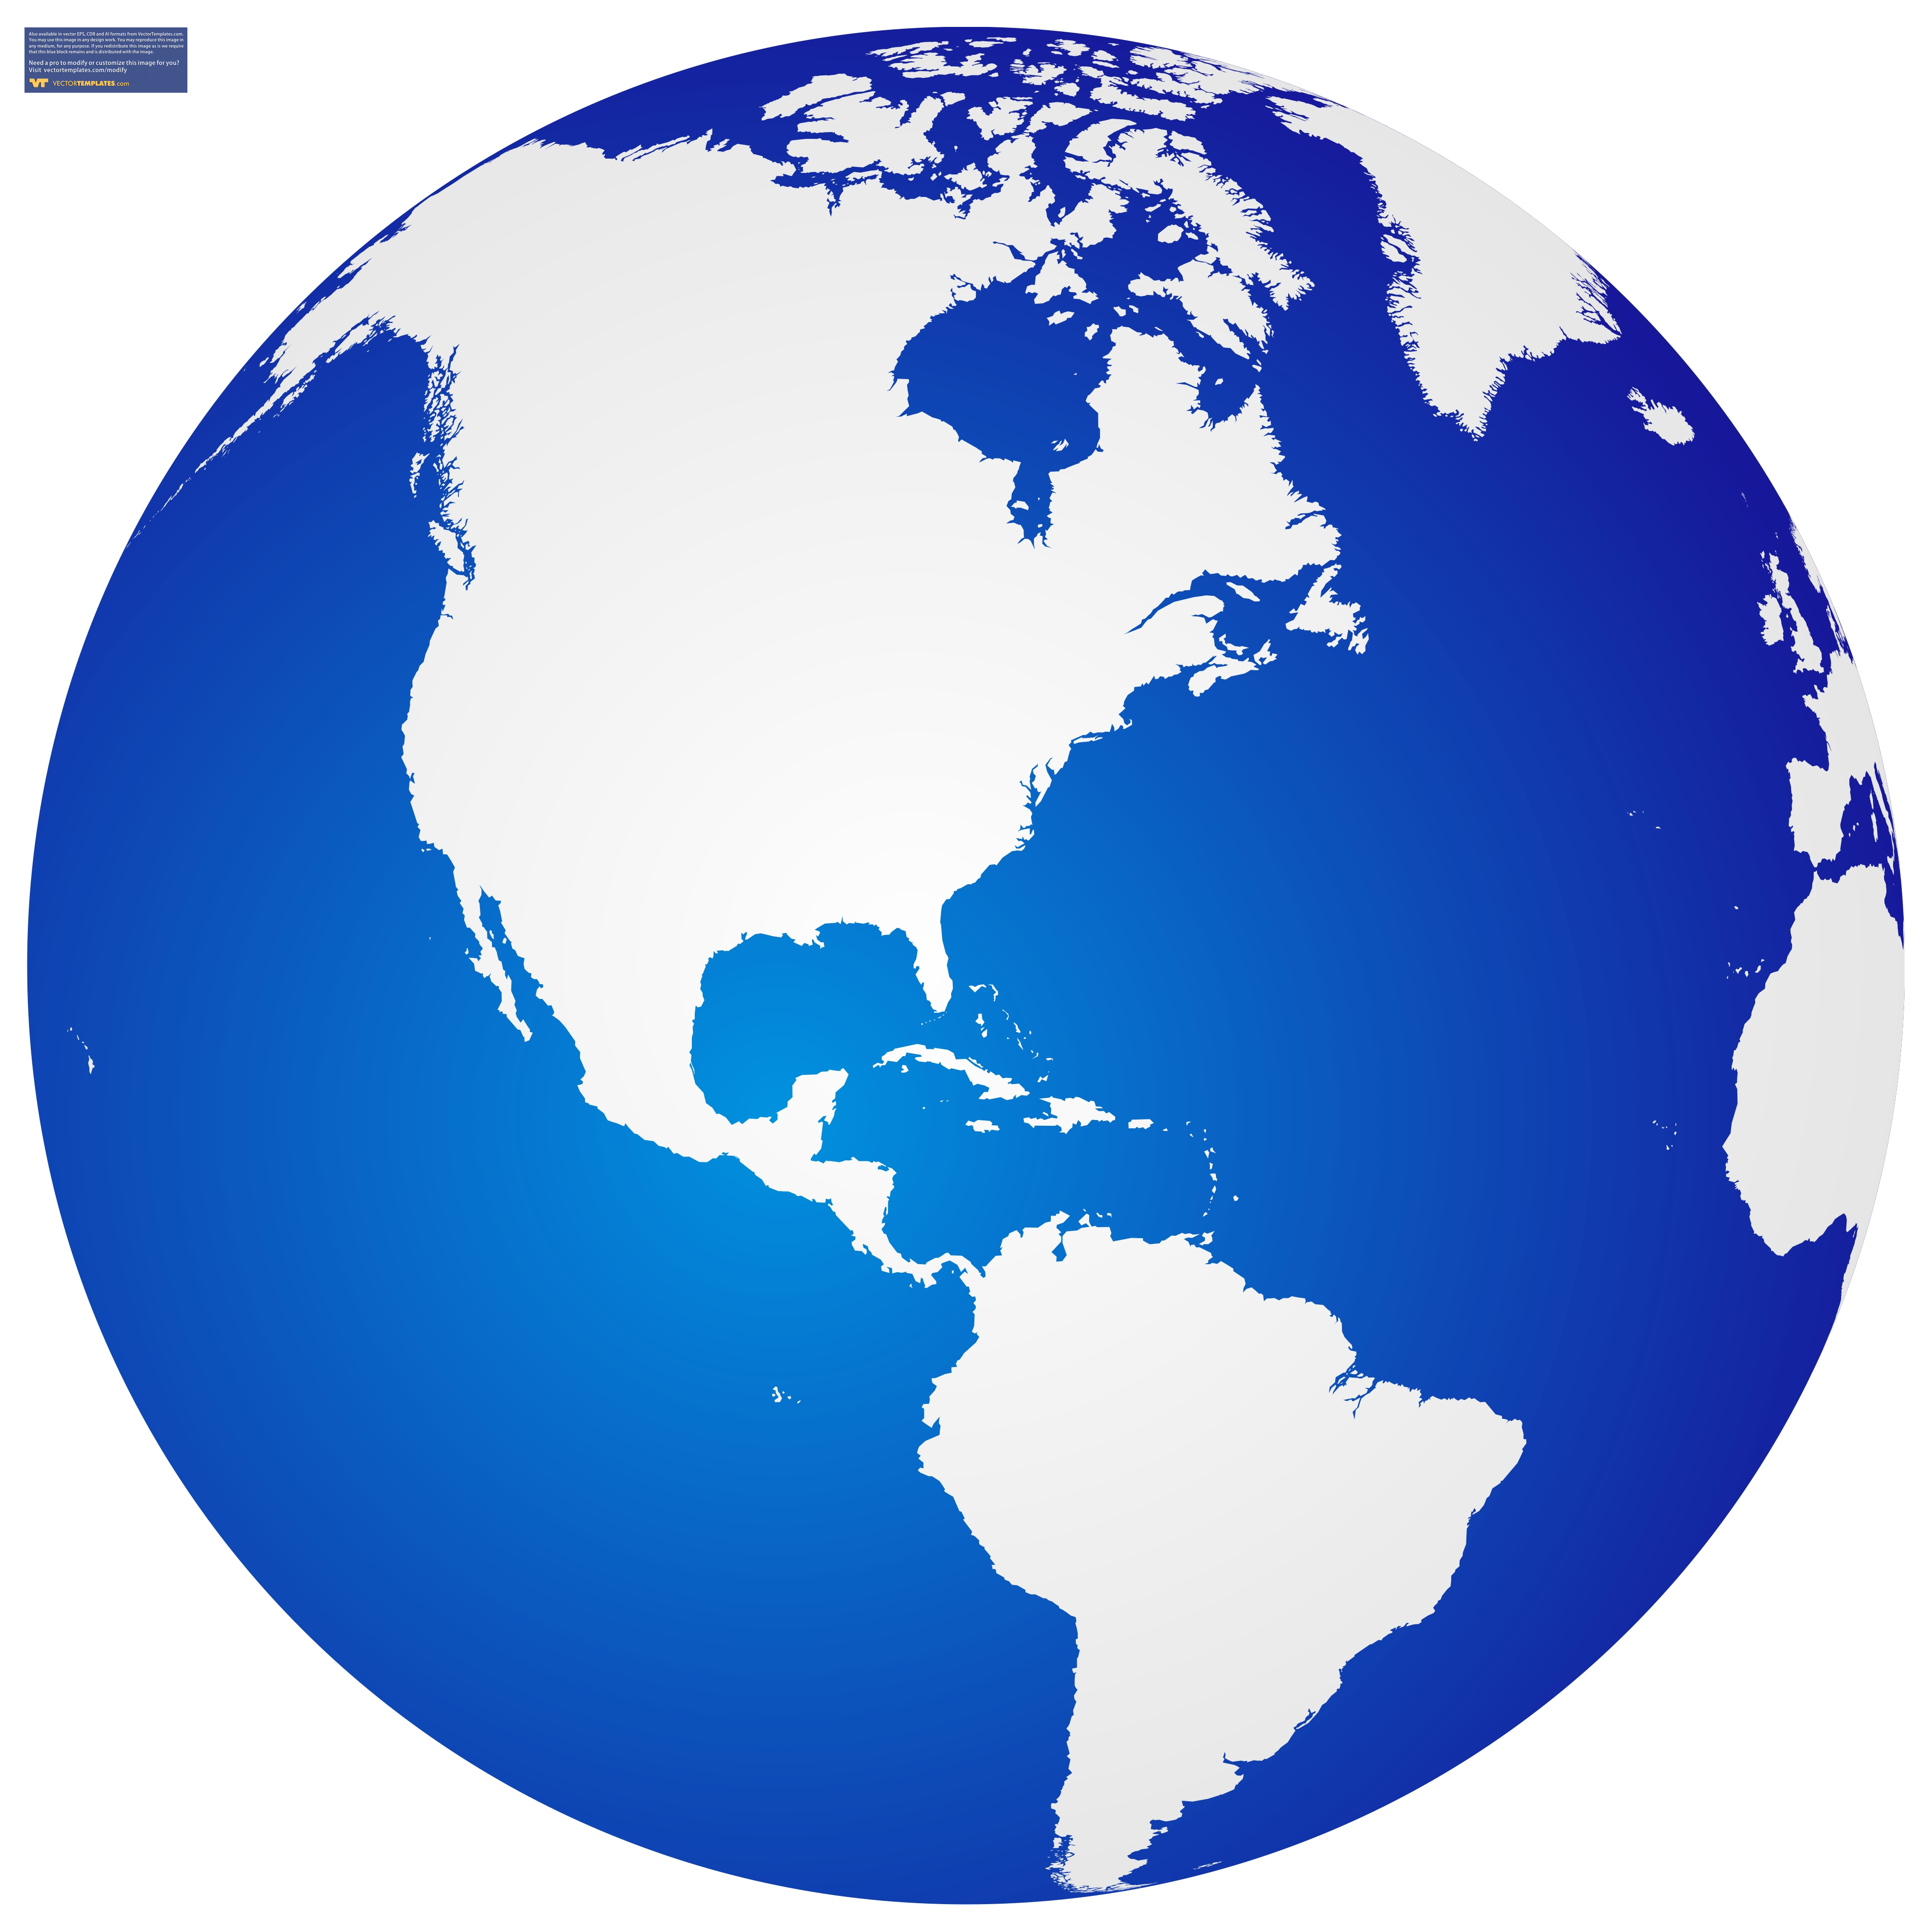 globes clipart panda free clipart images [ 4021 x 4021 Pixel ]